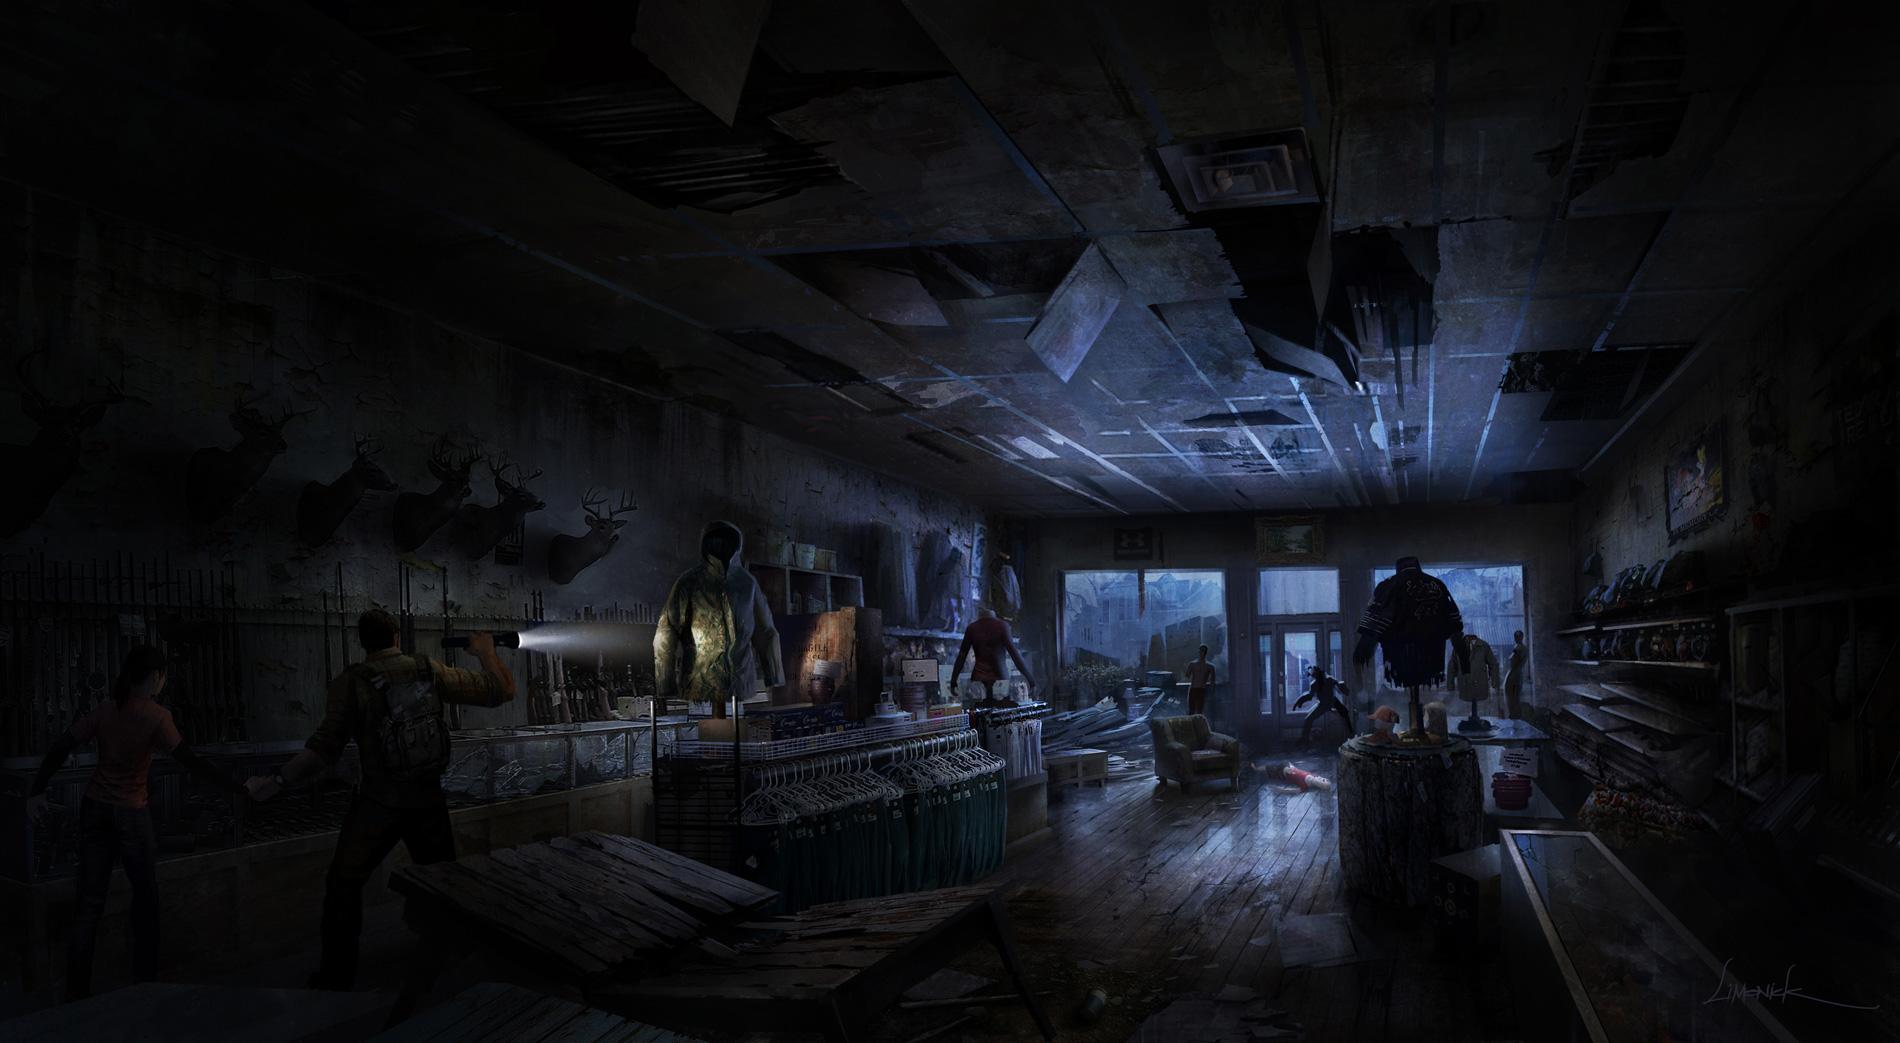 Metro 2033 Wallpaper Hd The Last Of Us Concept Art Concept Art World